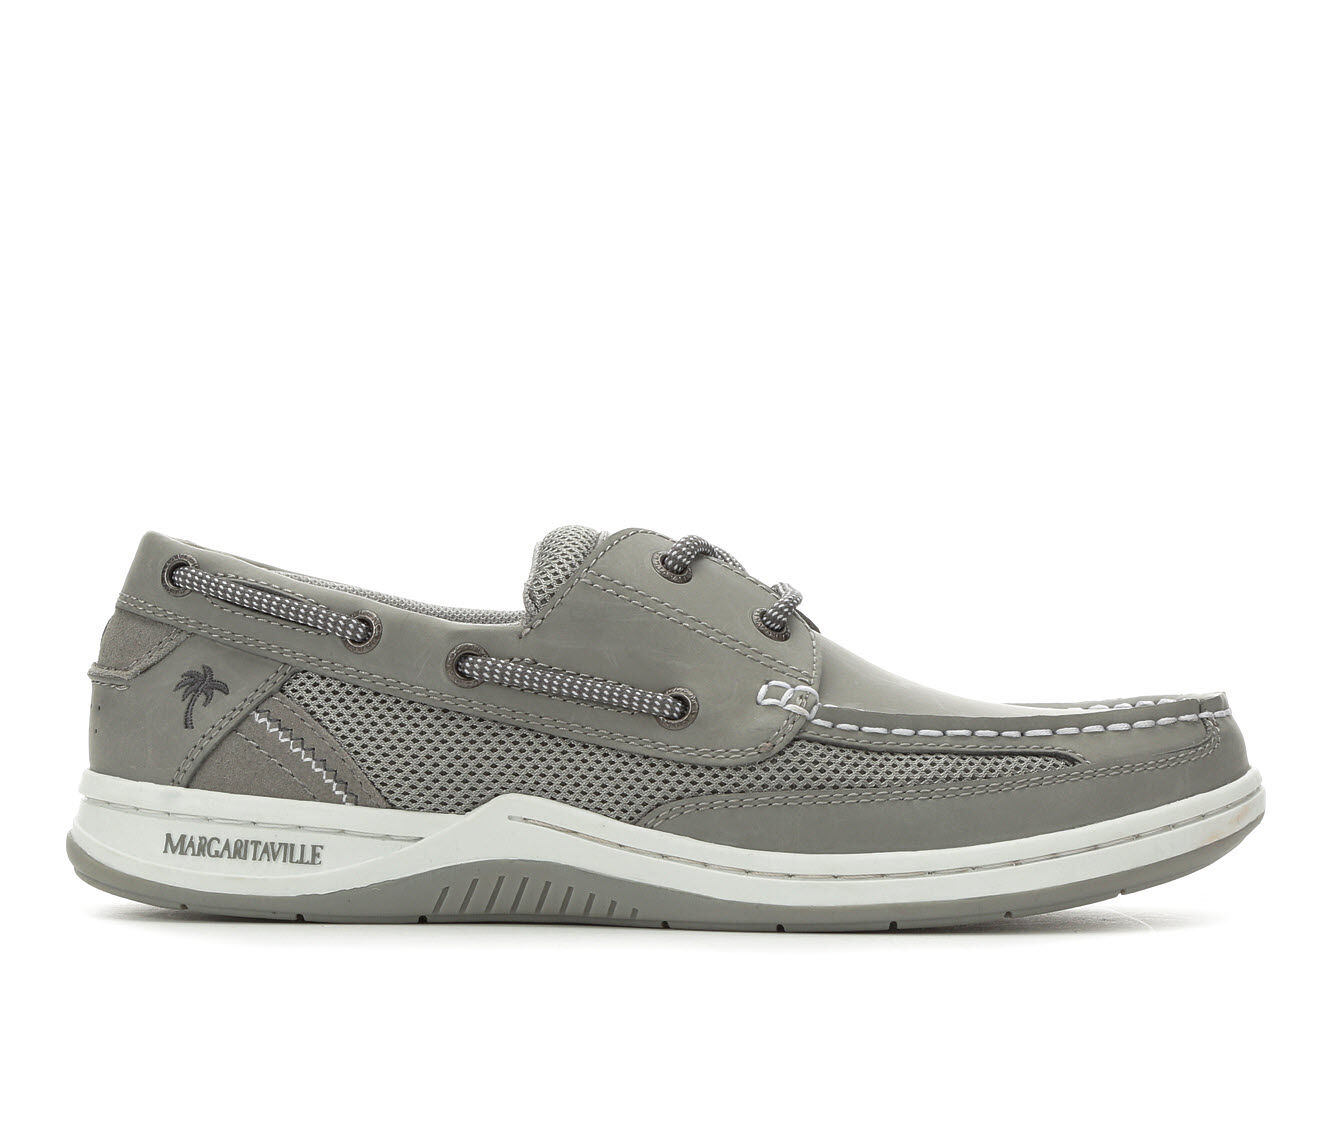 uk shoes_kd1420